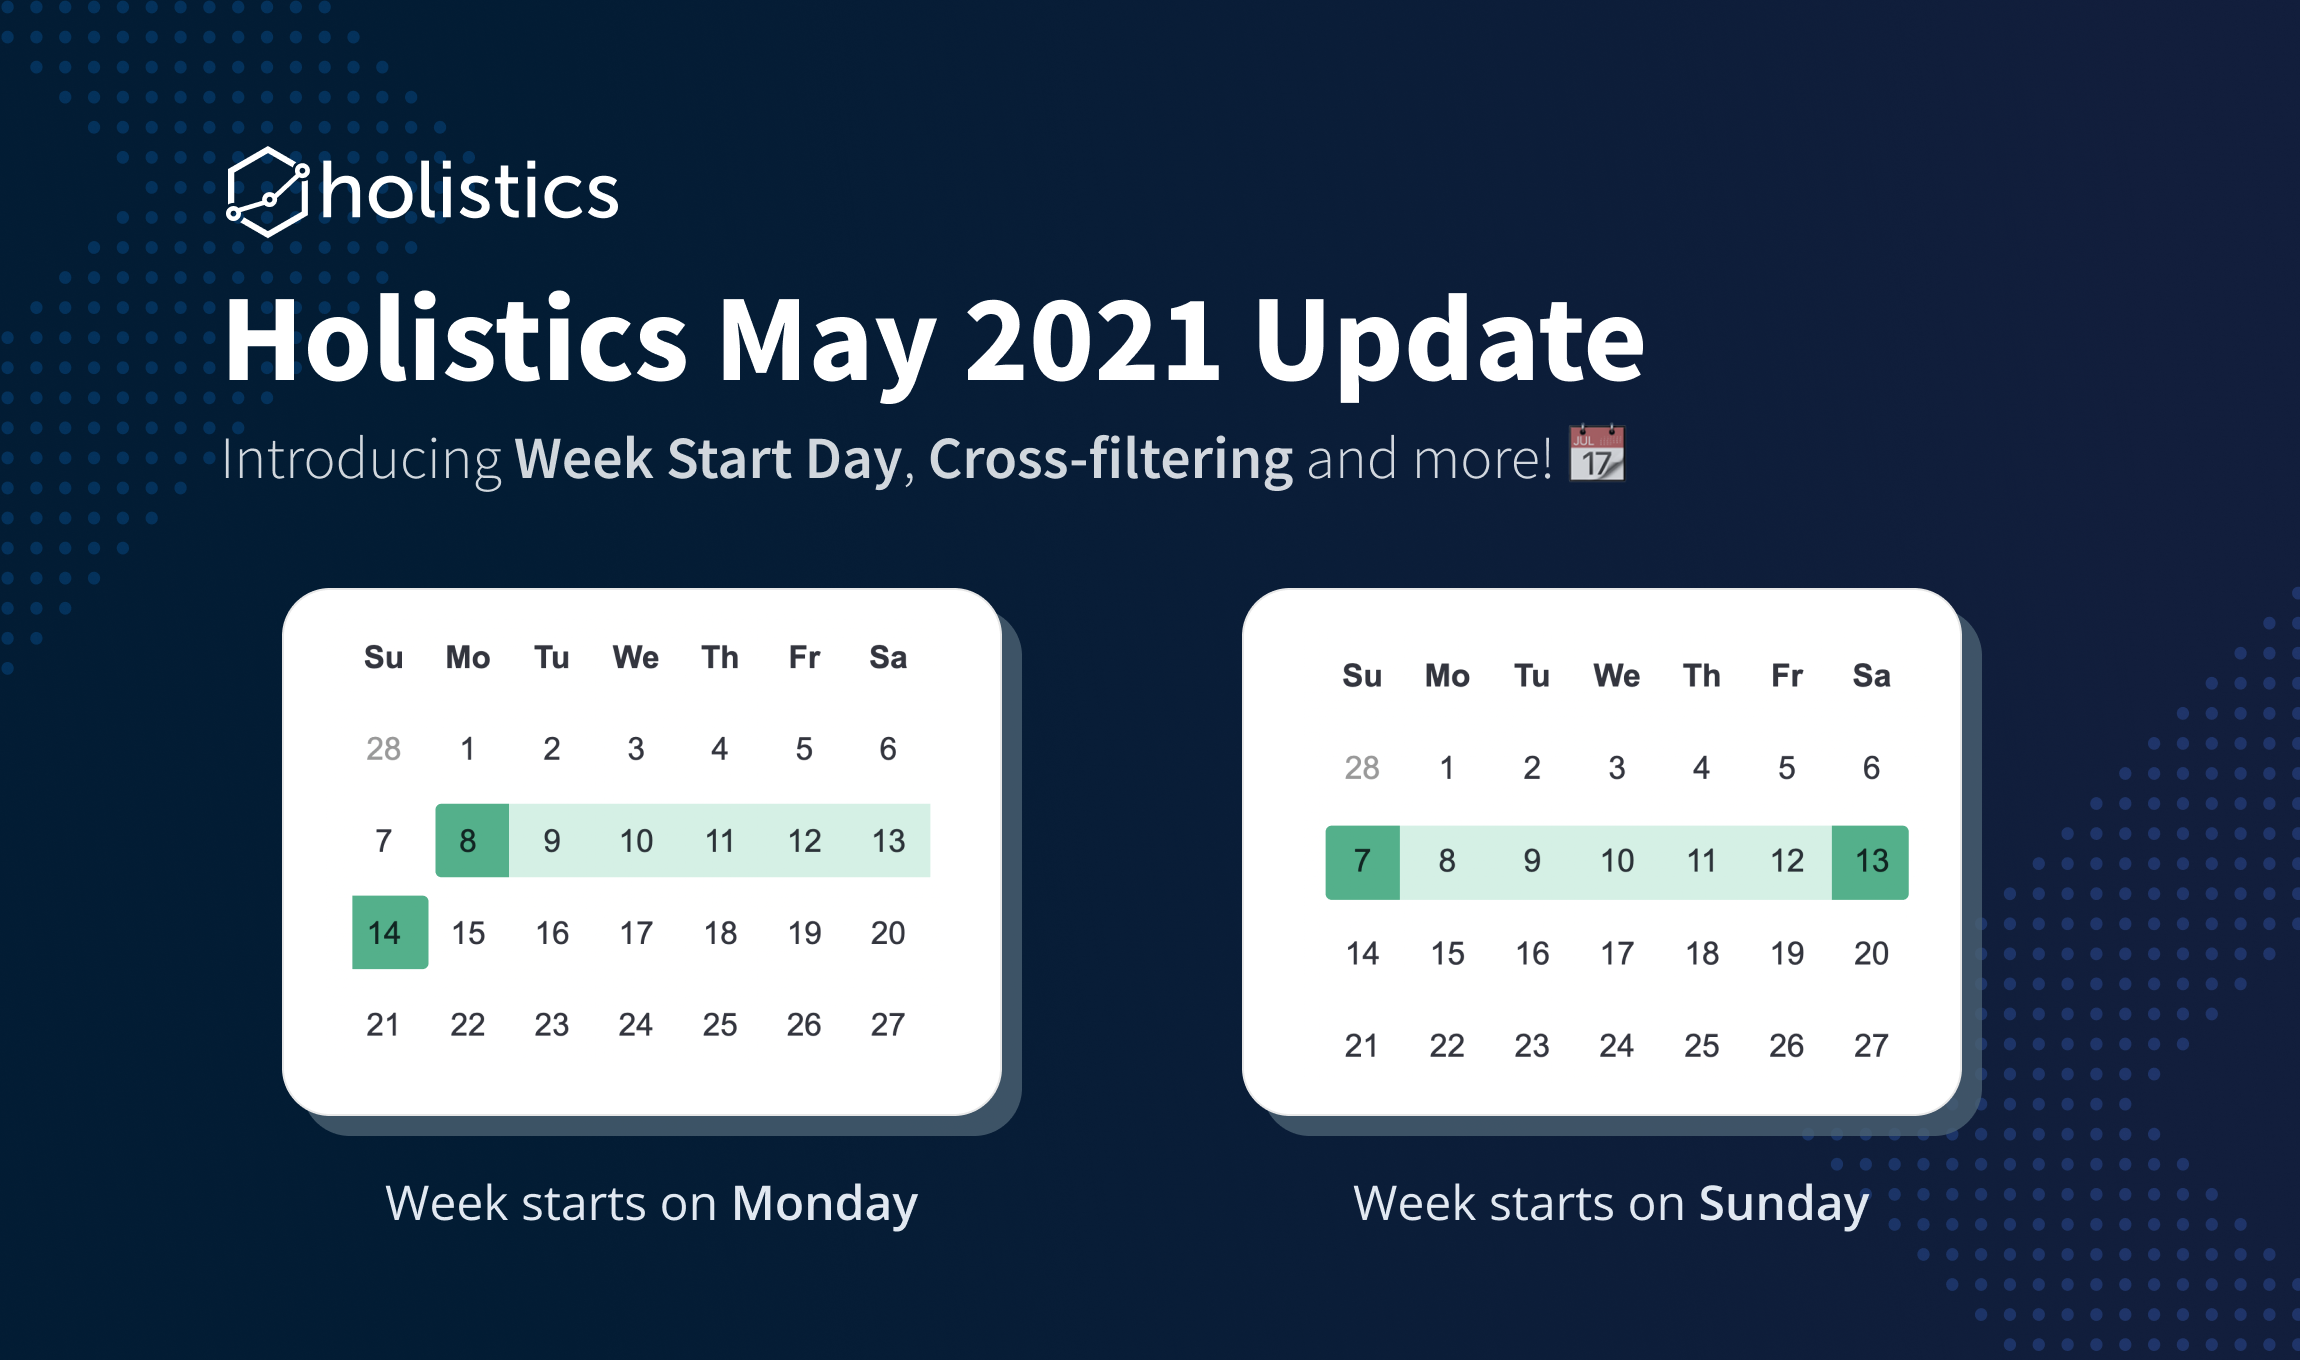 Holistics May 2021 Product Updates ⭐️